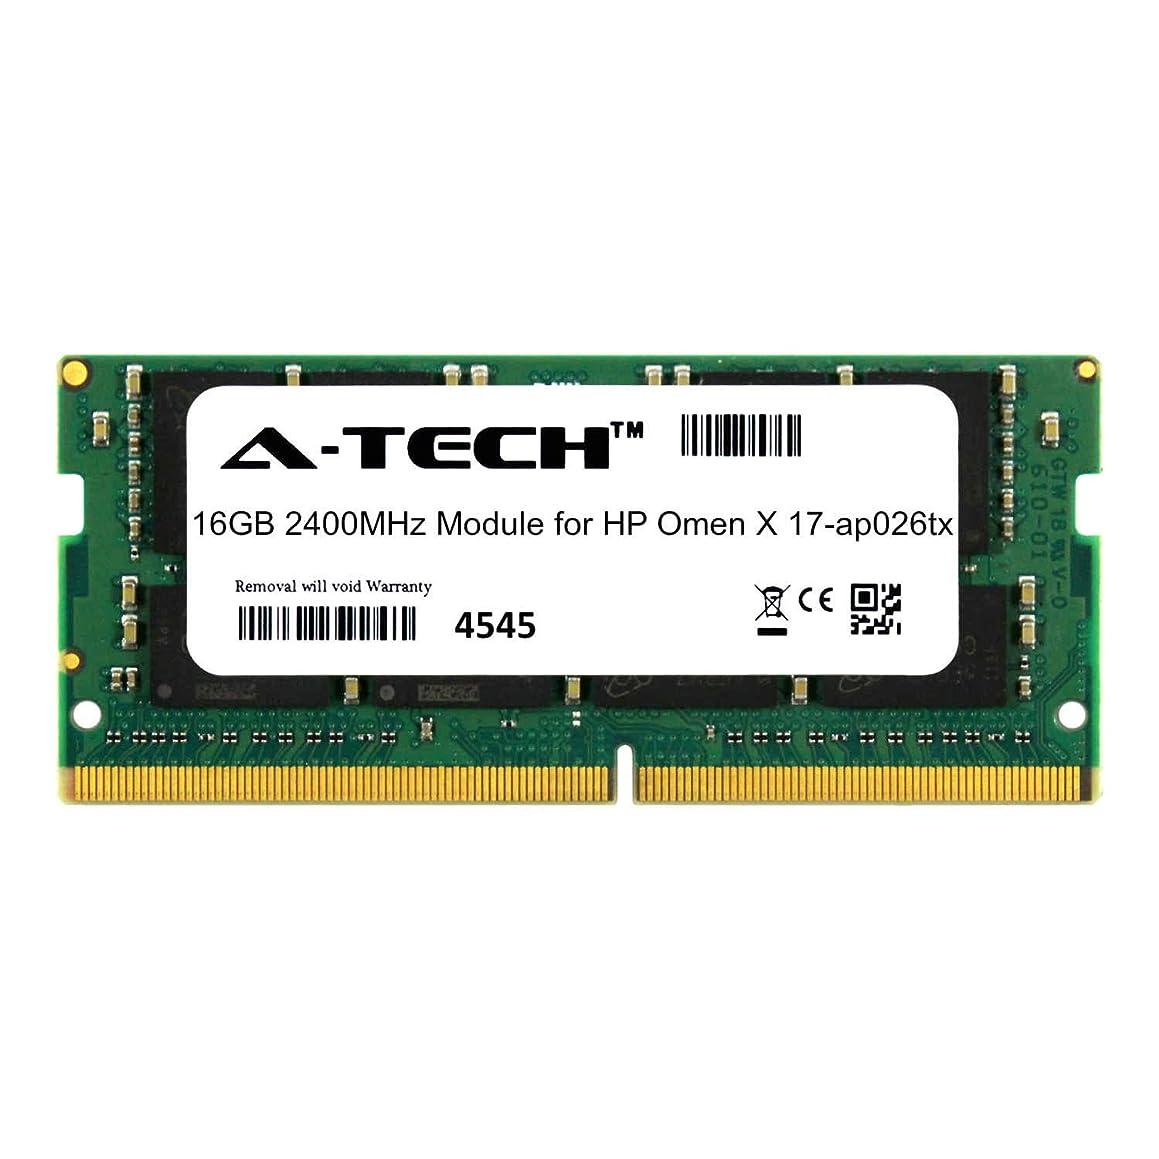 A-Tech 16GB Module for HP Omen X 17-ap026tx Laptop & Notebook Compatible DDR4 2400Mhz Memory Ram (ATMS282991A25831X1)